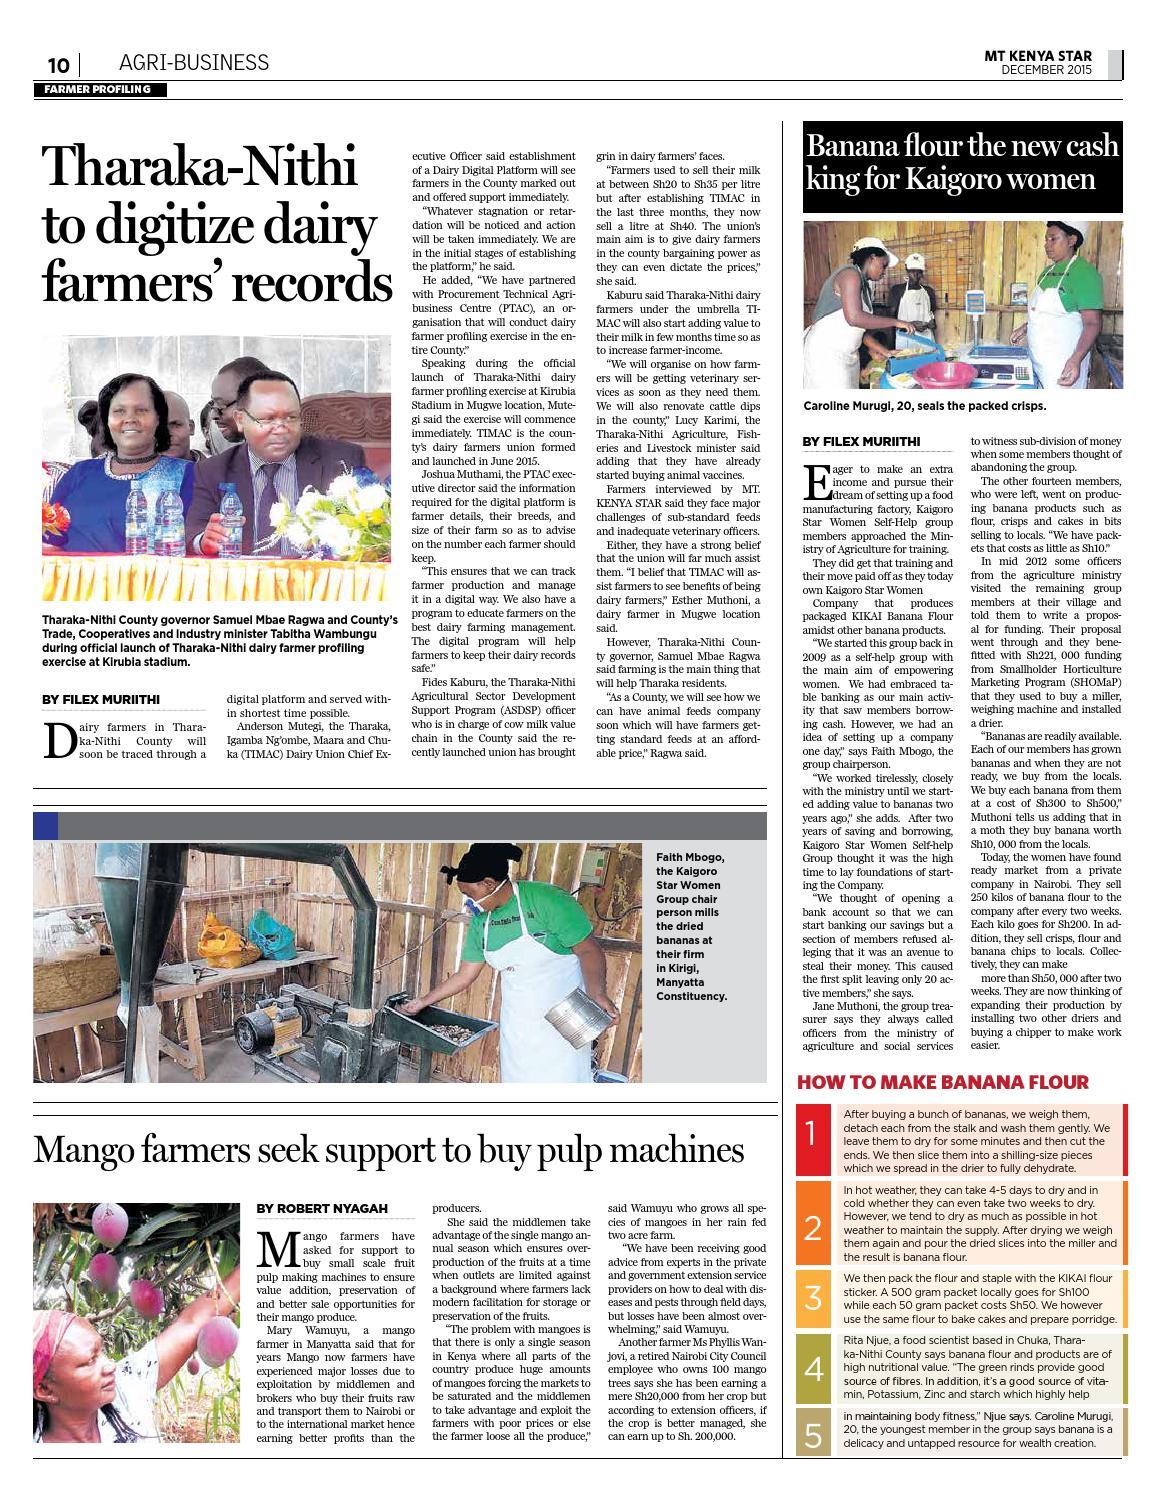 MT  KENYA STAR ISSUE 16 December 2015 by MT  KENYA STAR